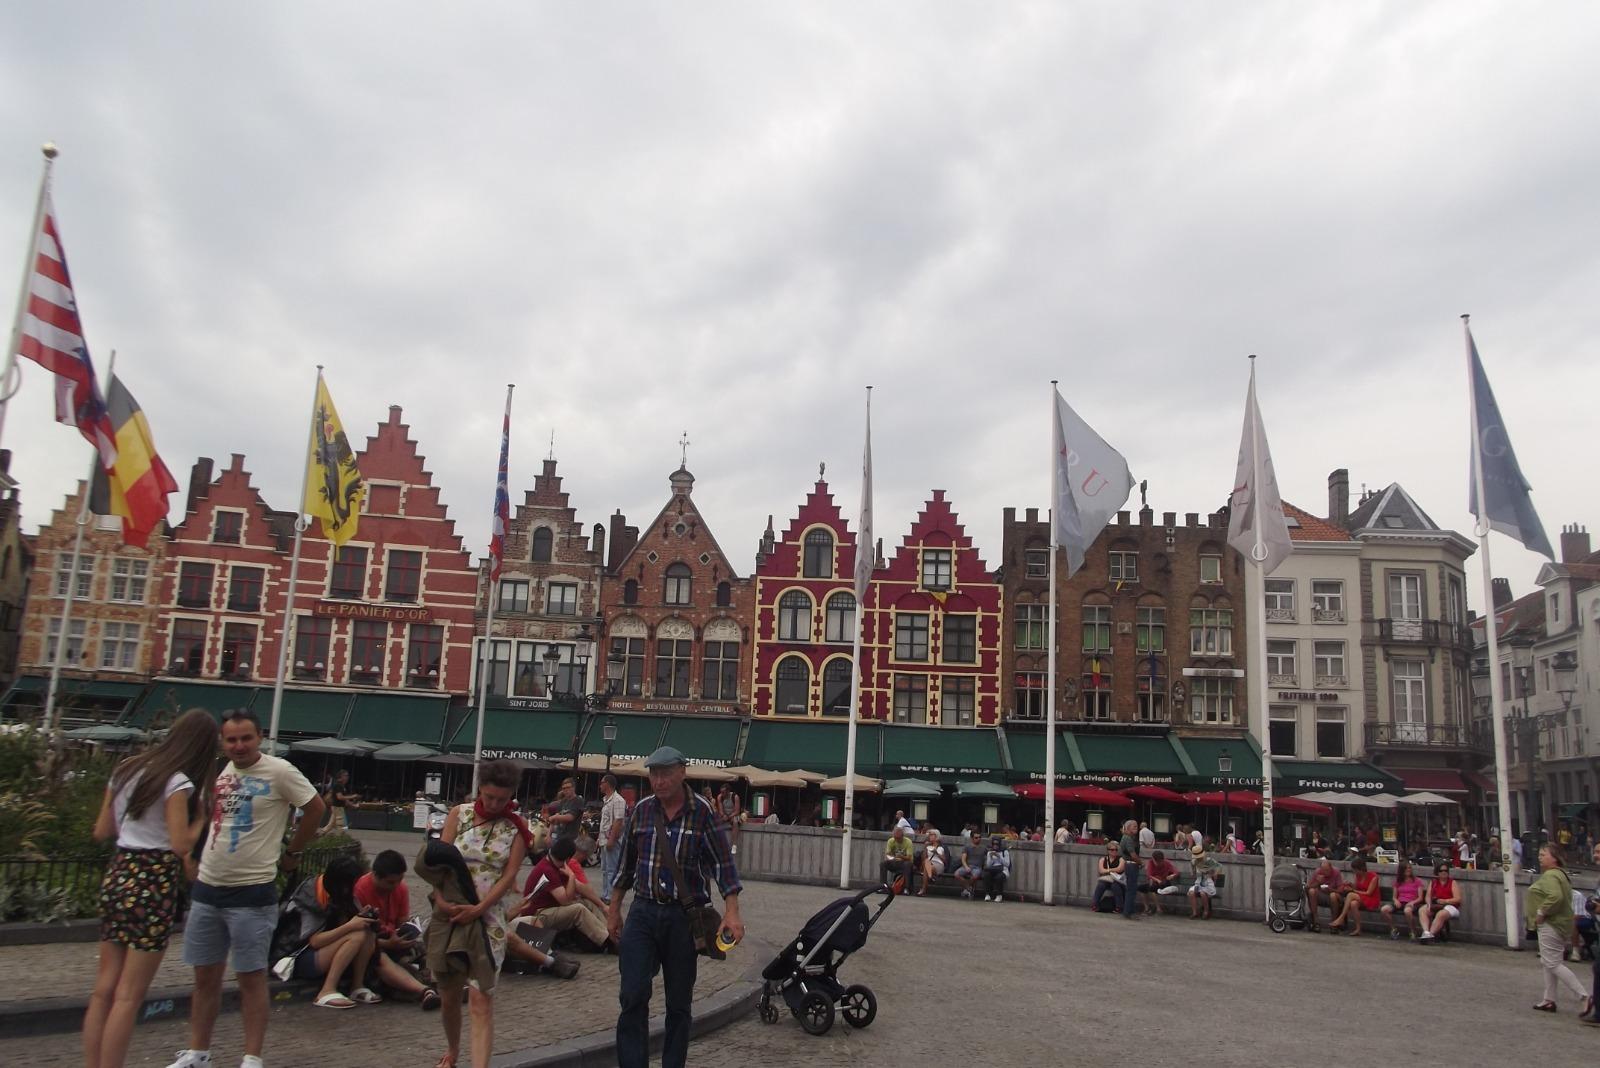 belgioelussemburgo31-1600418918.jpg